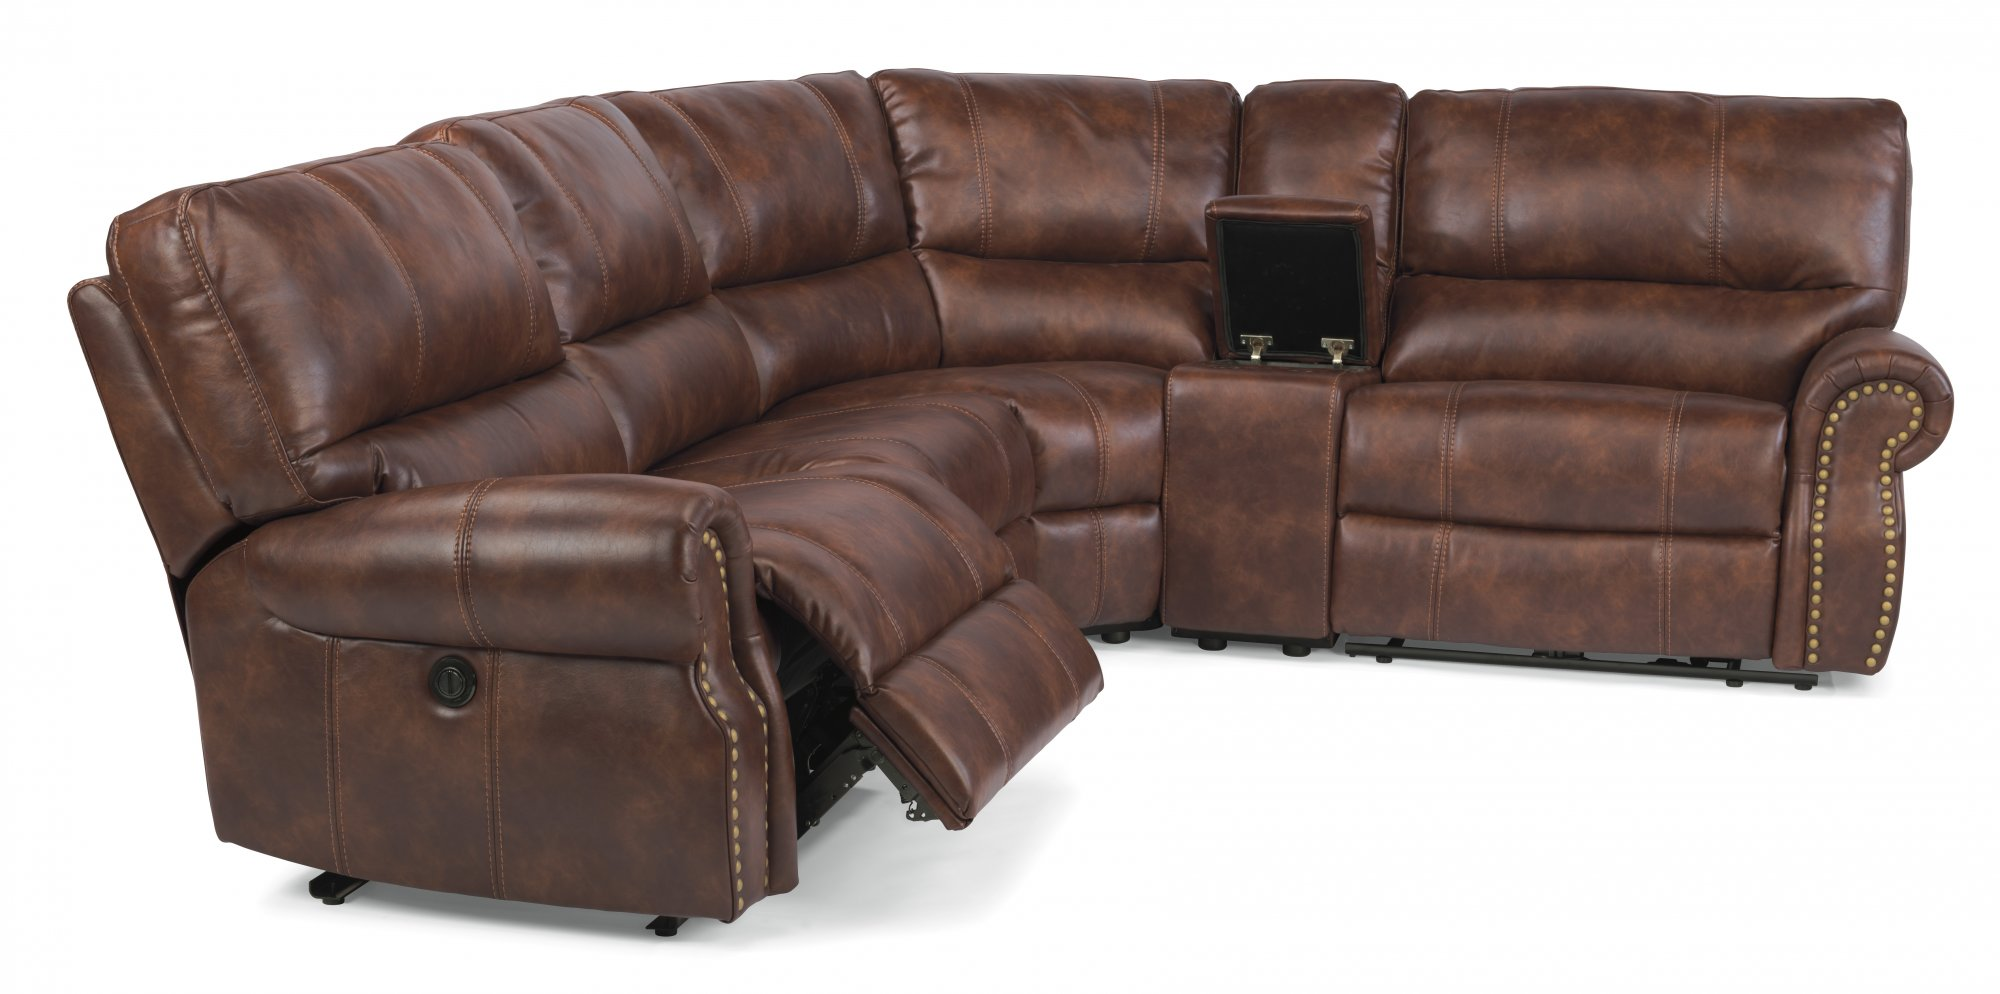 buchanan sofa cover la z boy james silt performance leather reclining large sectional amazing unique shaped home design